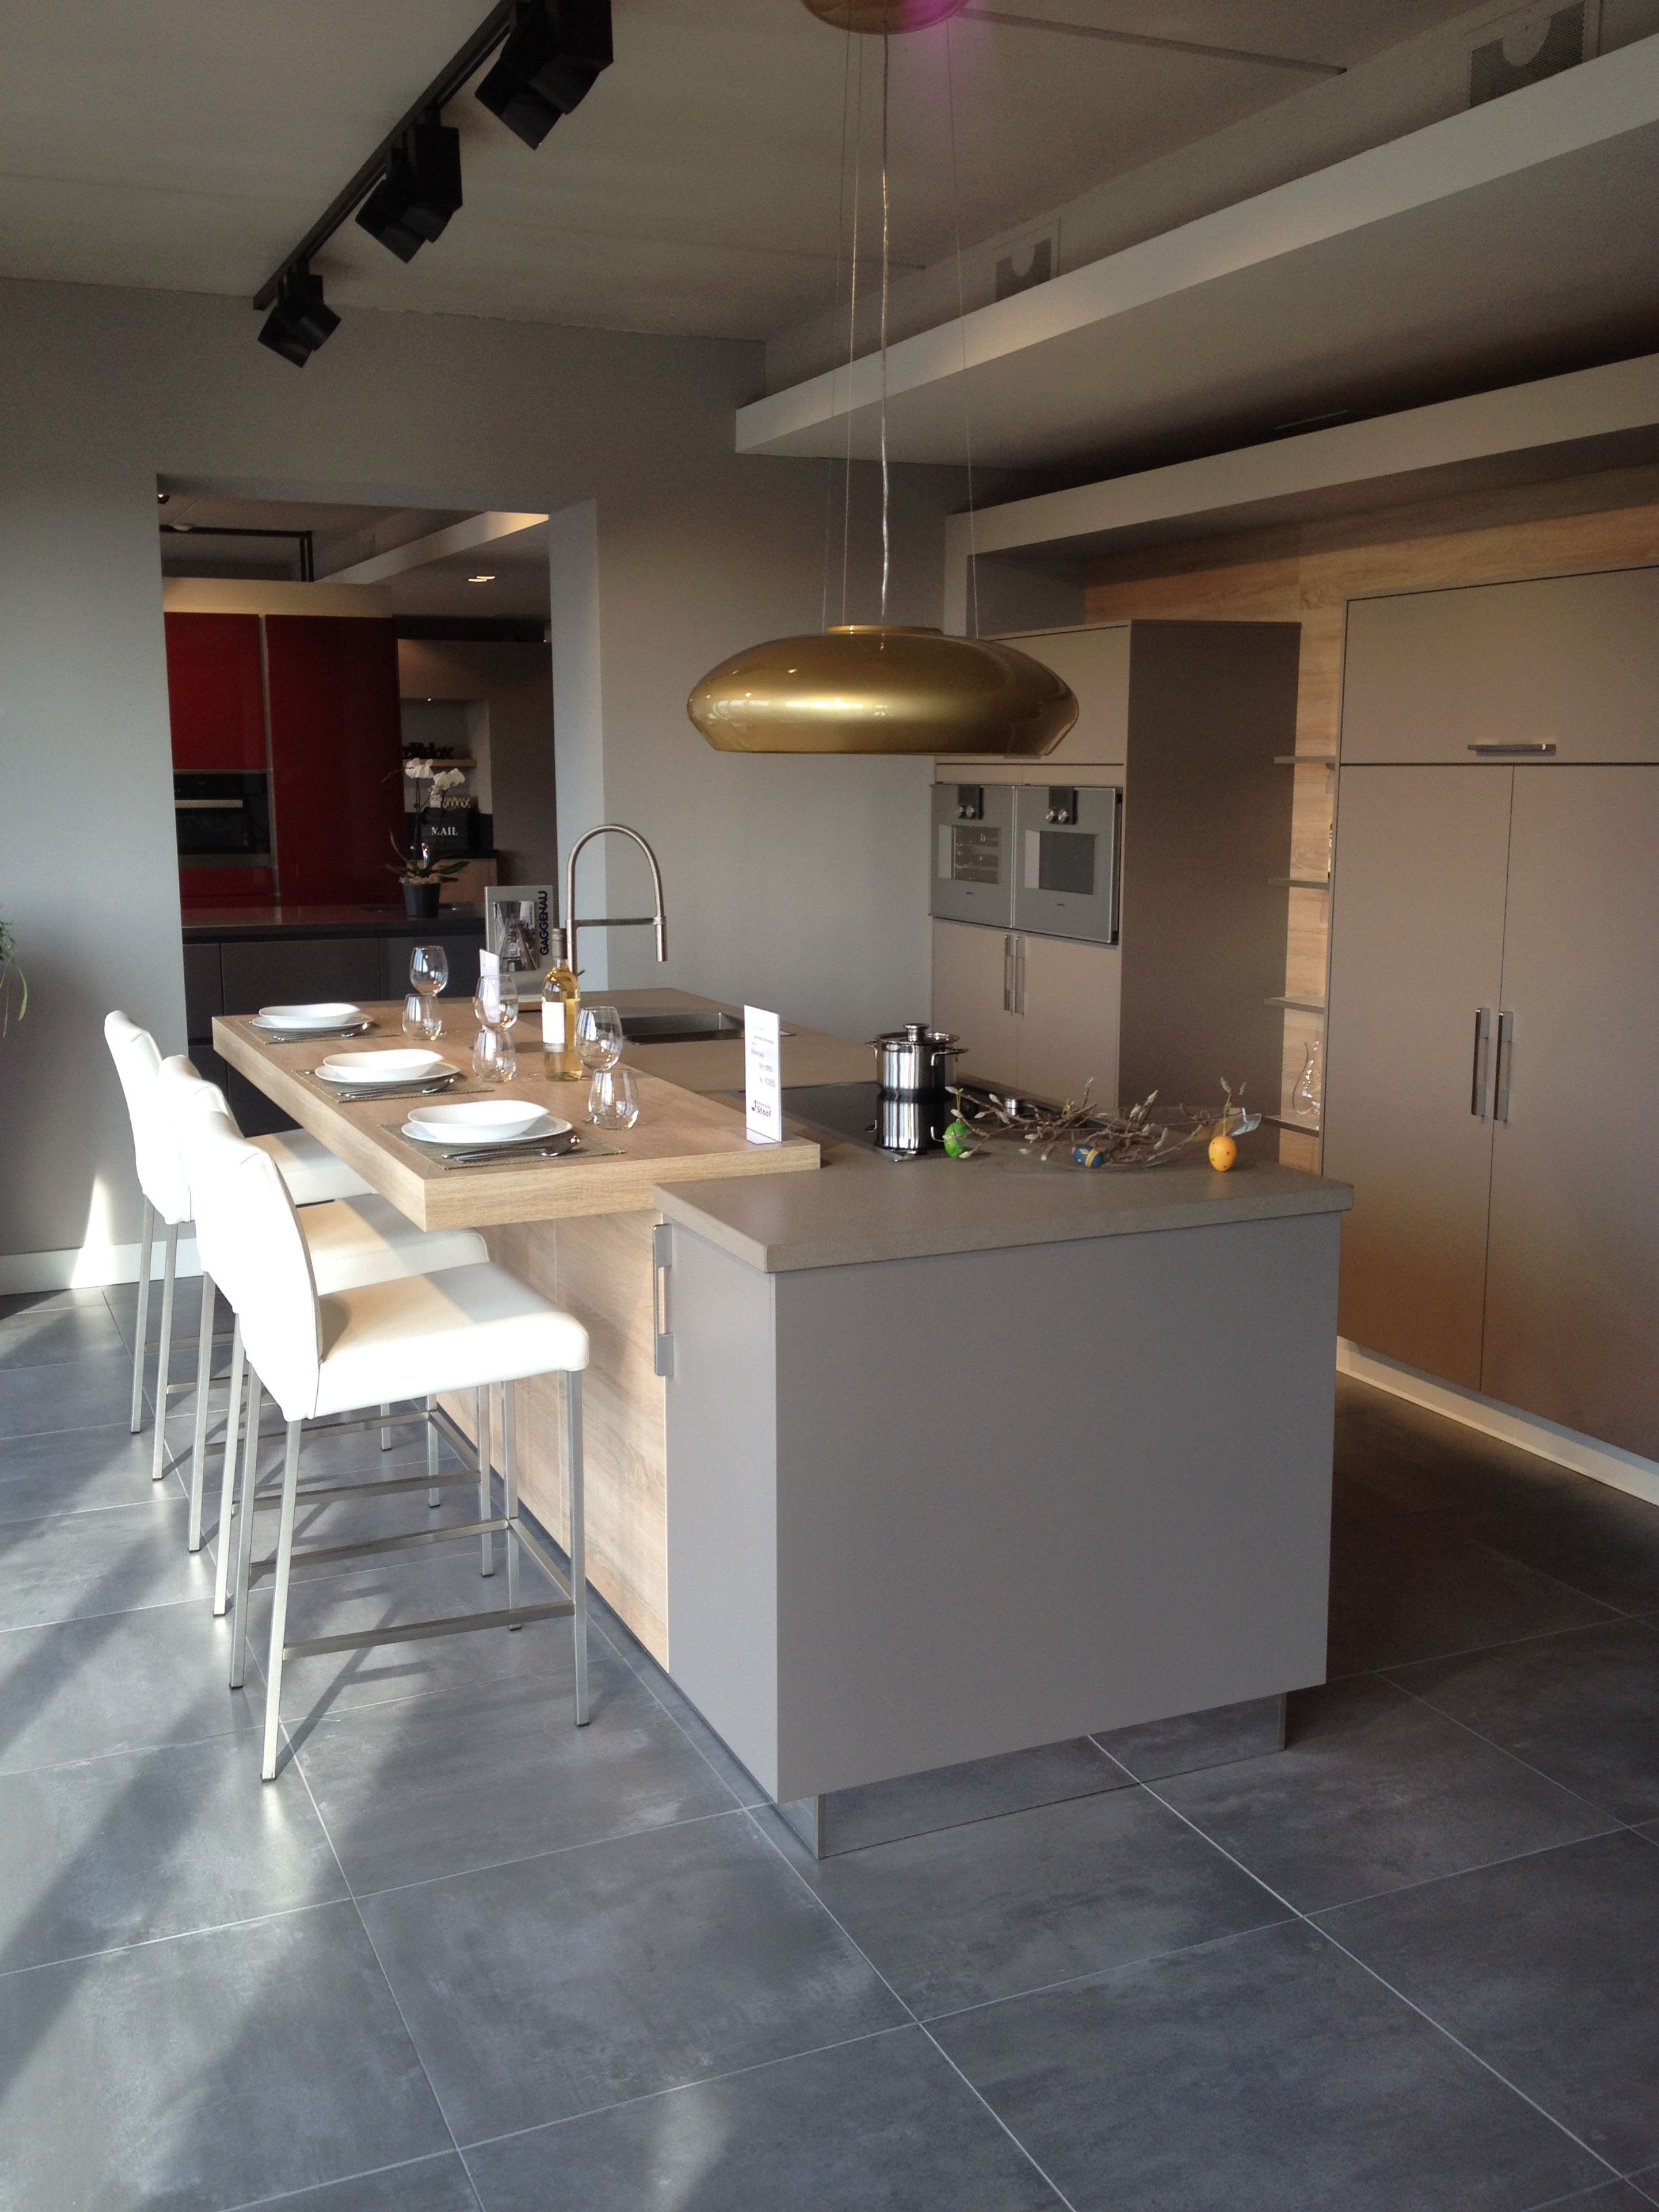 Moderne eiland keuken | Samen koken, kletsen en eten | Leefkeuken ...